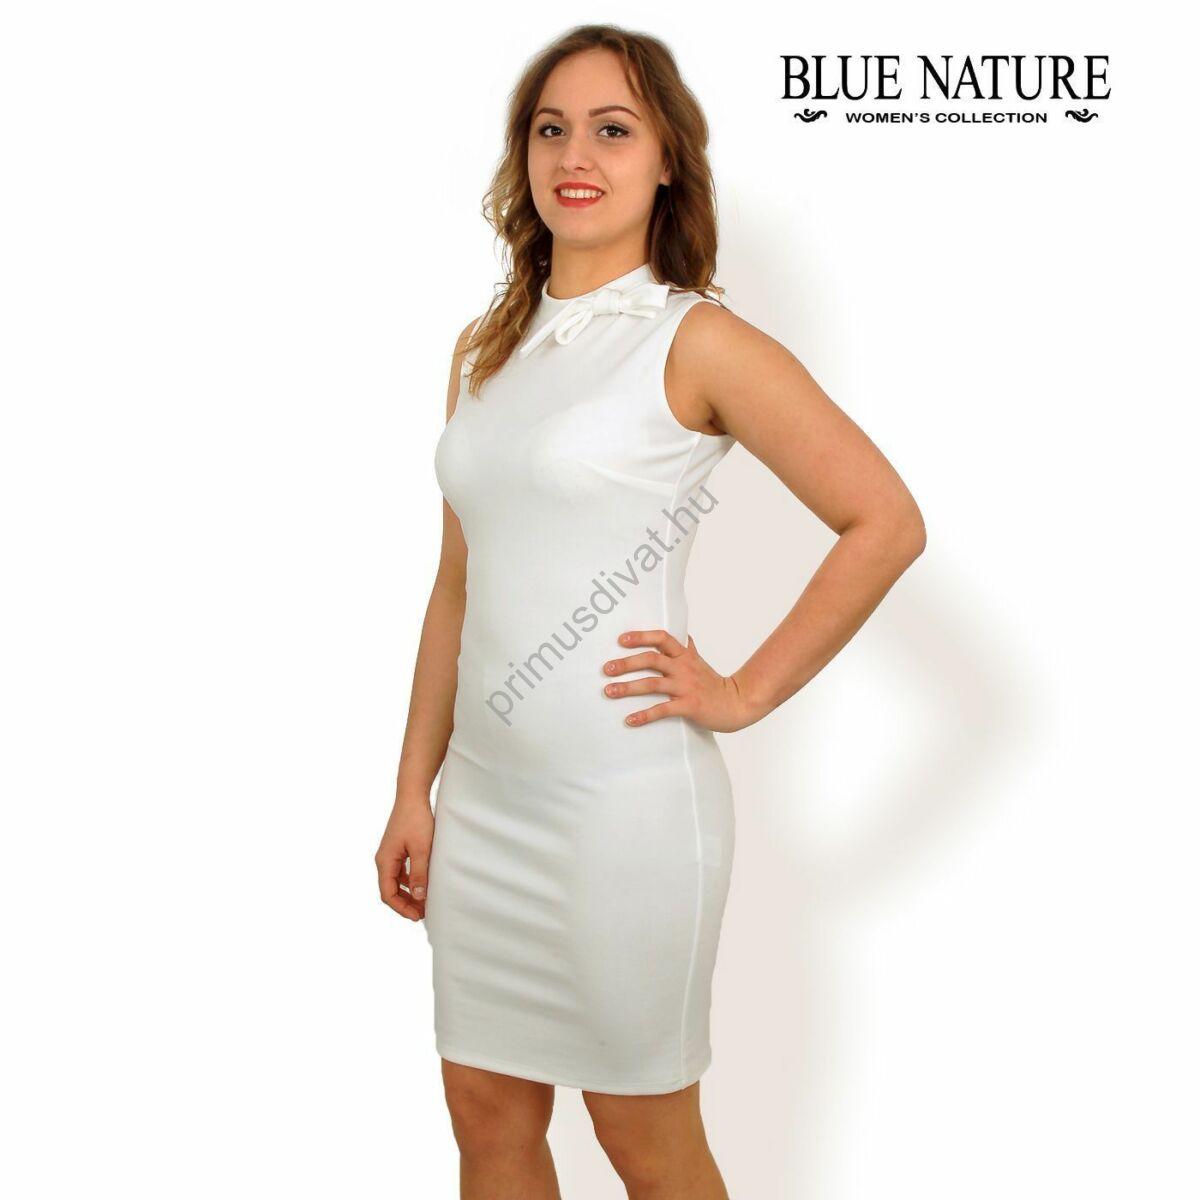 ee42e5d8d7 Kép 1/1 - Blue Nature masnis nyakú, vaj színű, rugalmas anyagú ujjatlan ruha